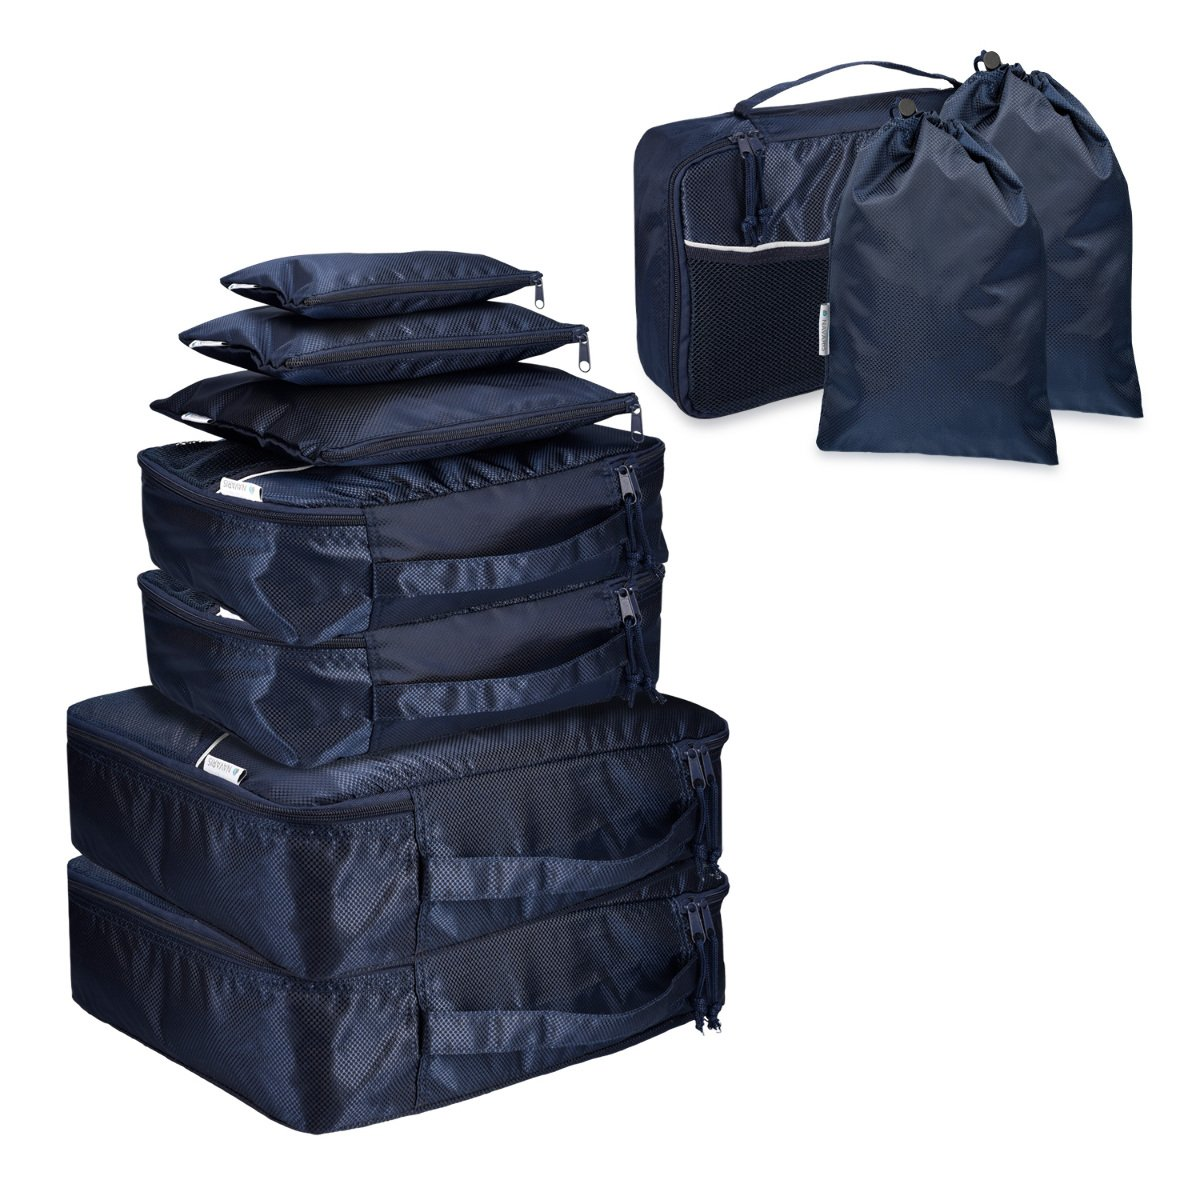 f6b7daa502622 Set de 9 Bolsas para Maleta de Navaris en Azul Oscuro - Bolsas de Ropa  Zapatos Ropa Sucia Mochila Organizador de Maleta Equipaje Viaje Vacaciones   ...